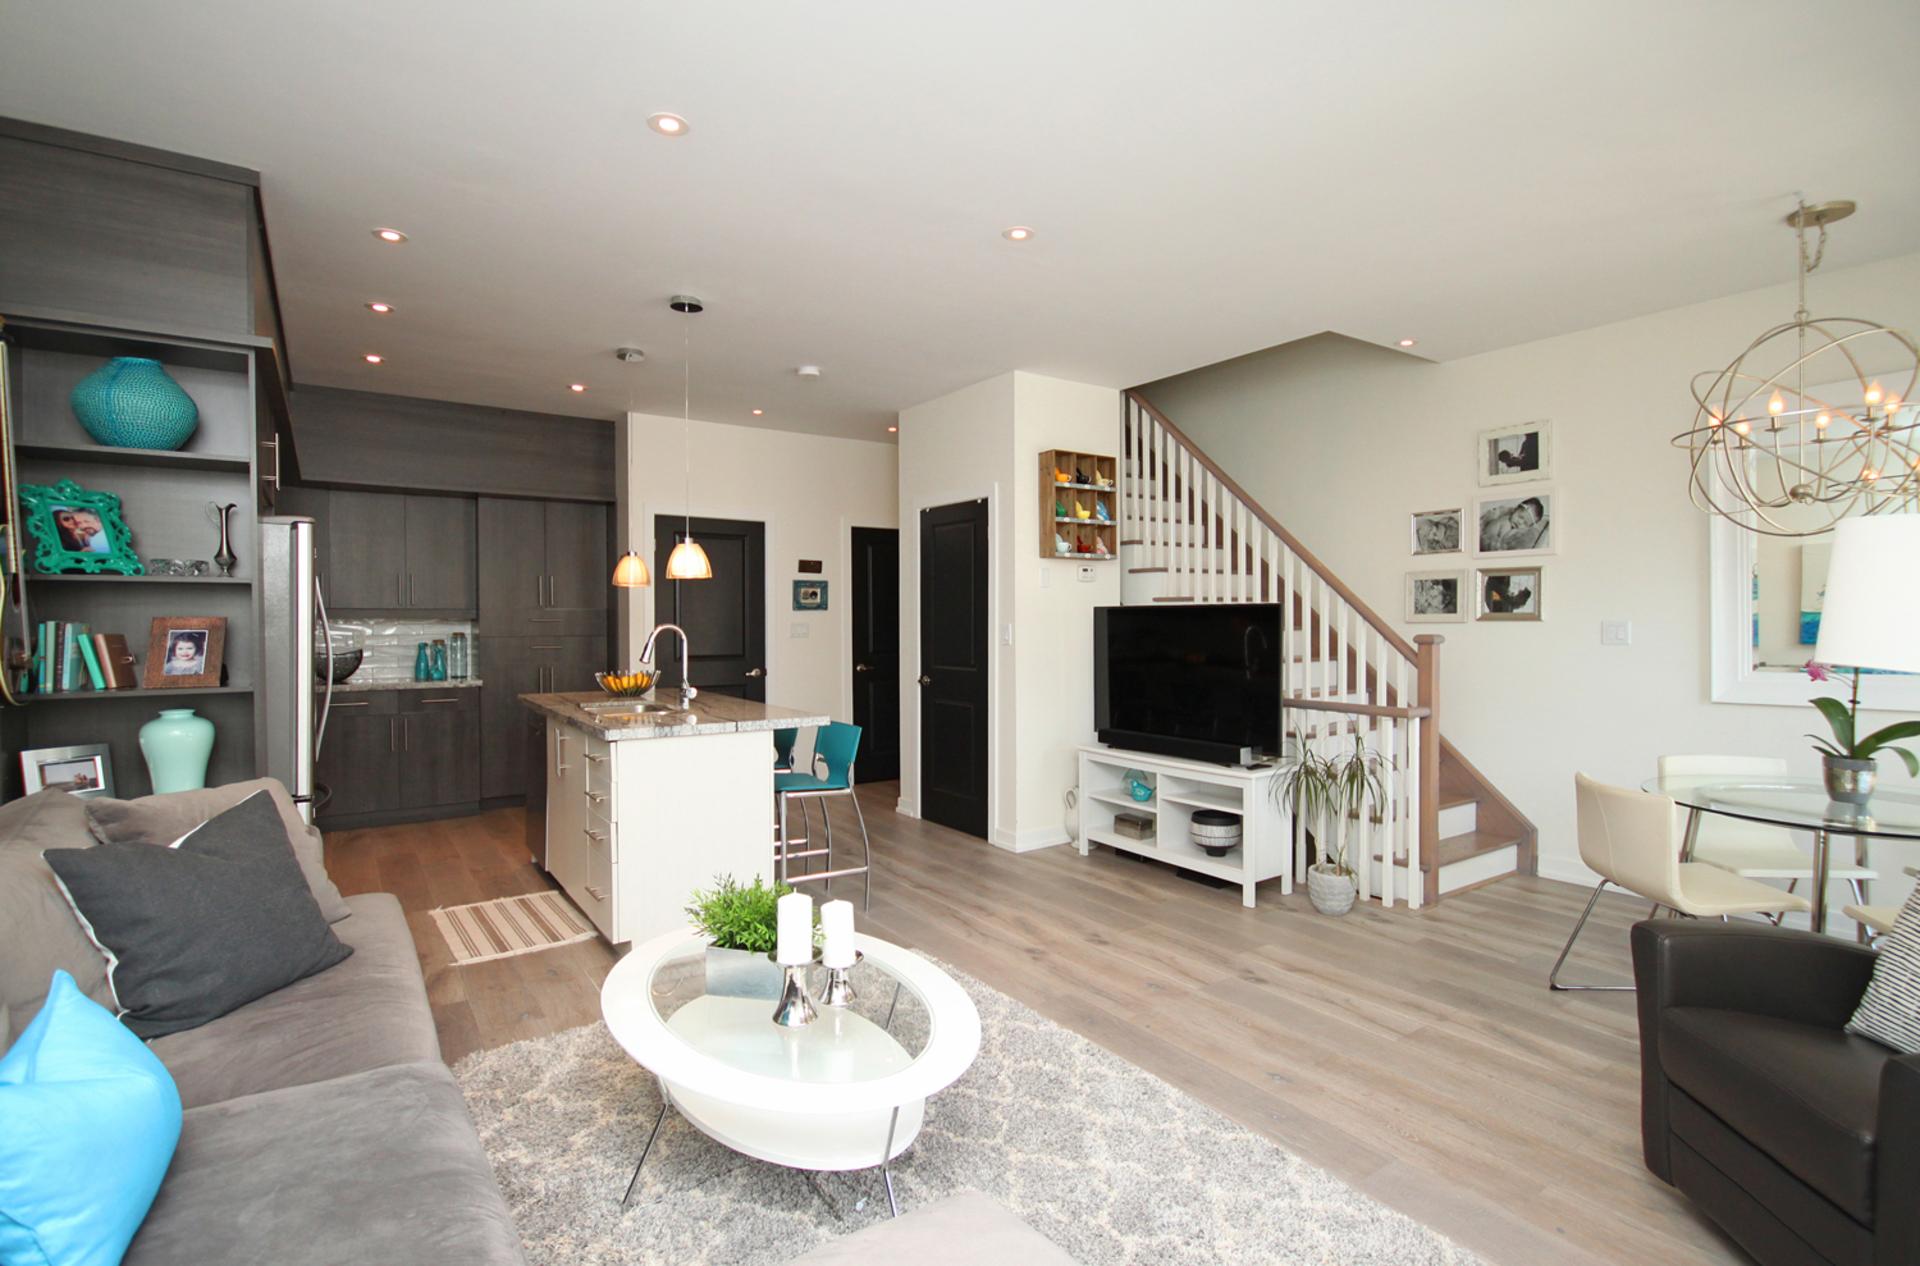 Kitchen, Living & Dining Room at 114 - 2320 Gerrard Street E, East End-Danforth, Toronto